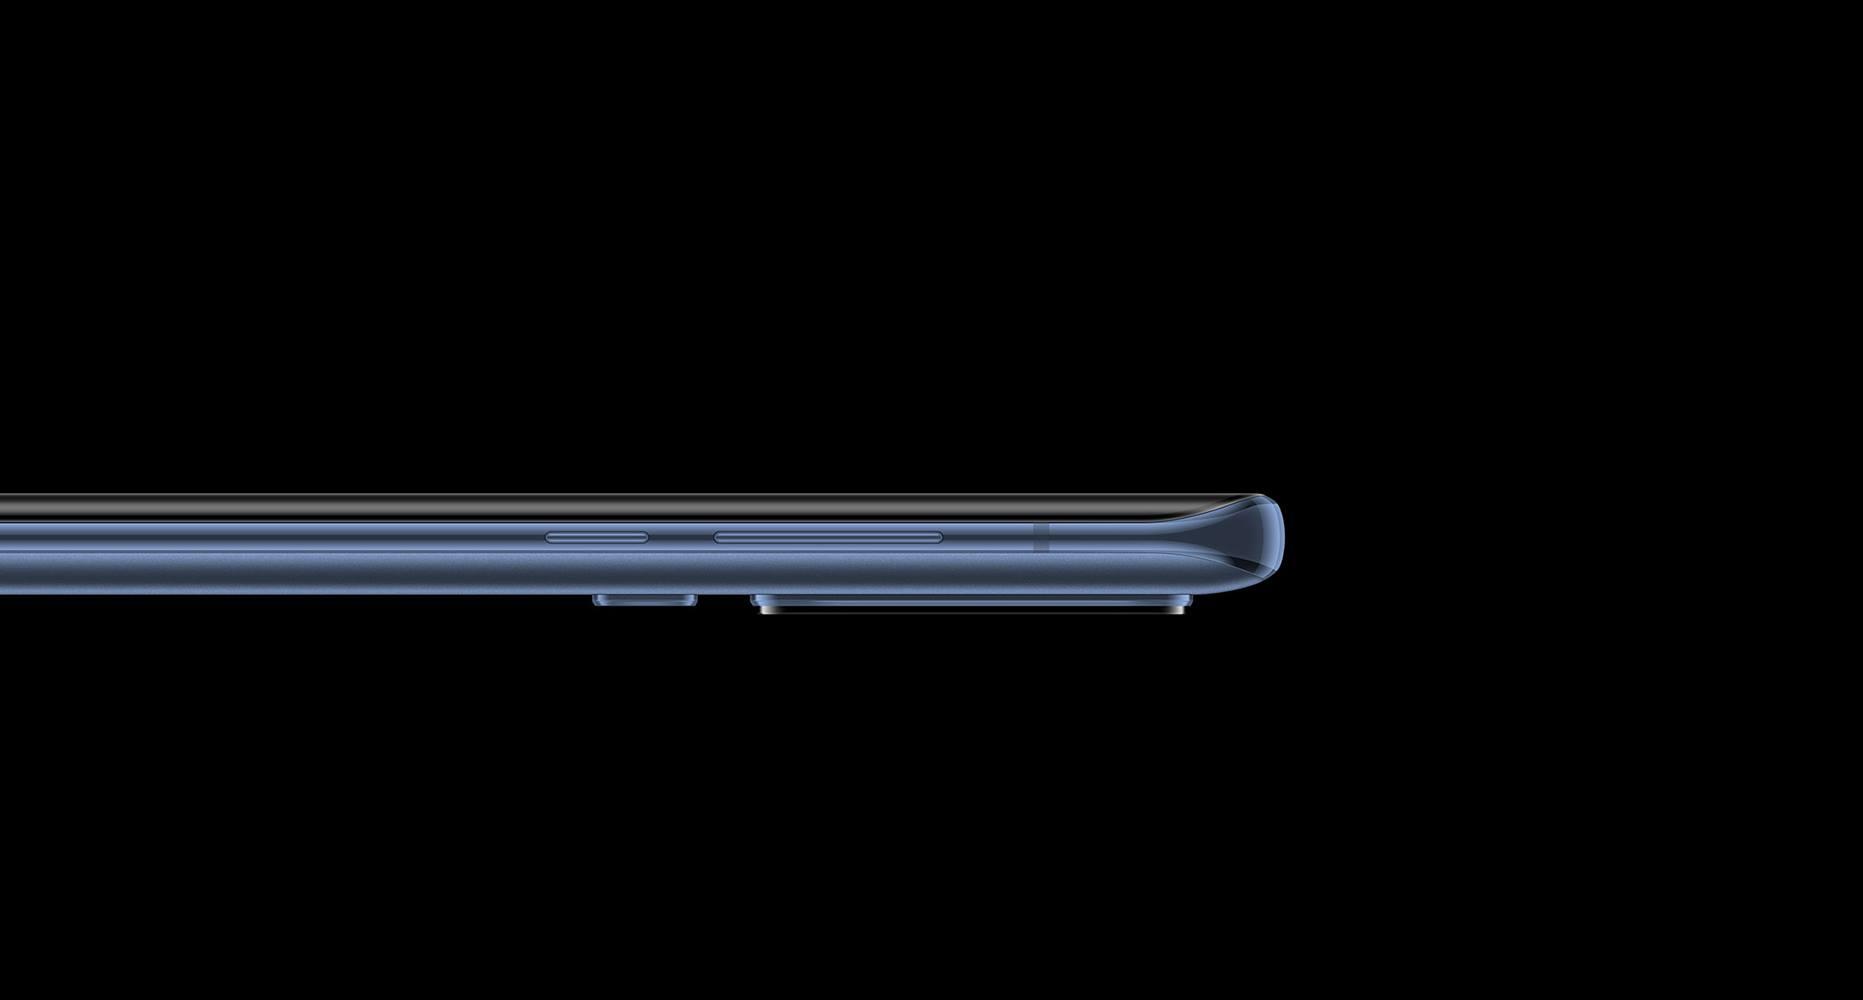 Xiaomi Mi 10 Pro 5G (7)